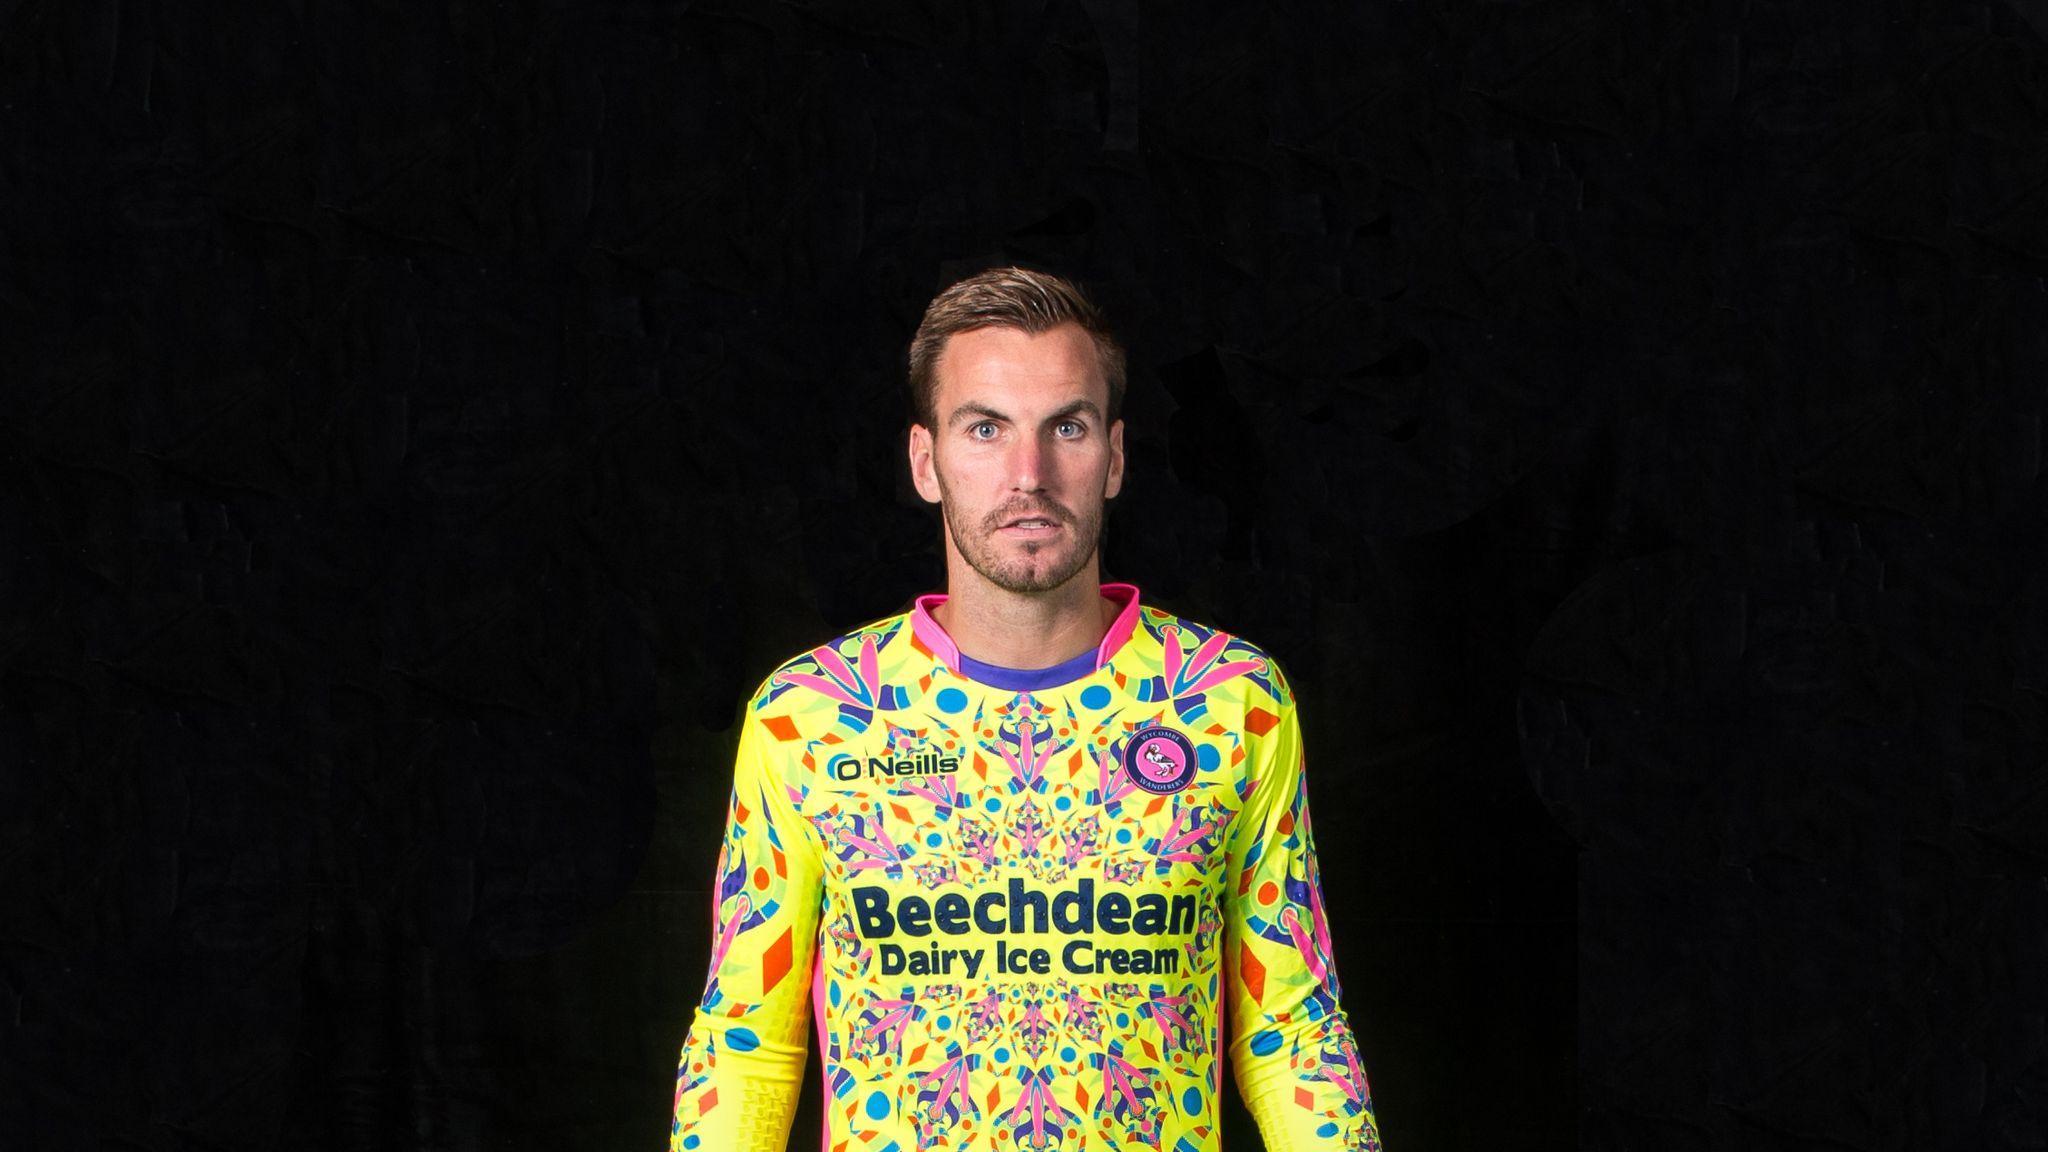 c66bab03f24 Wycombe Wanderers launch eye-catching goalkeeping kit with 'disruptive  magic-eye effect' | Football News | Sky Sports